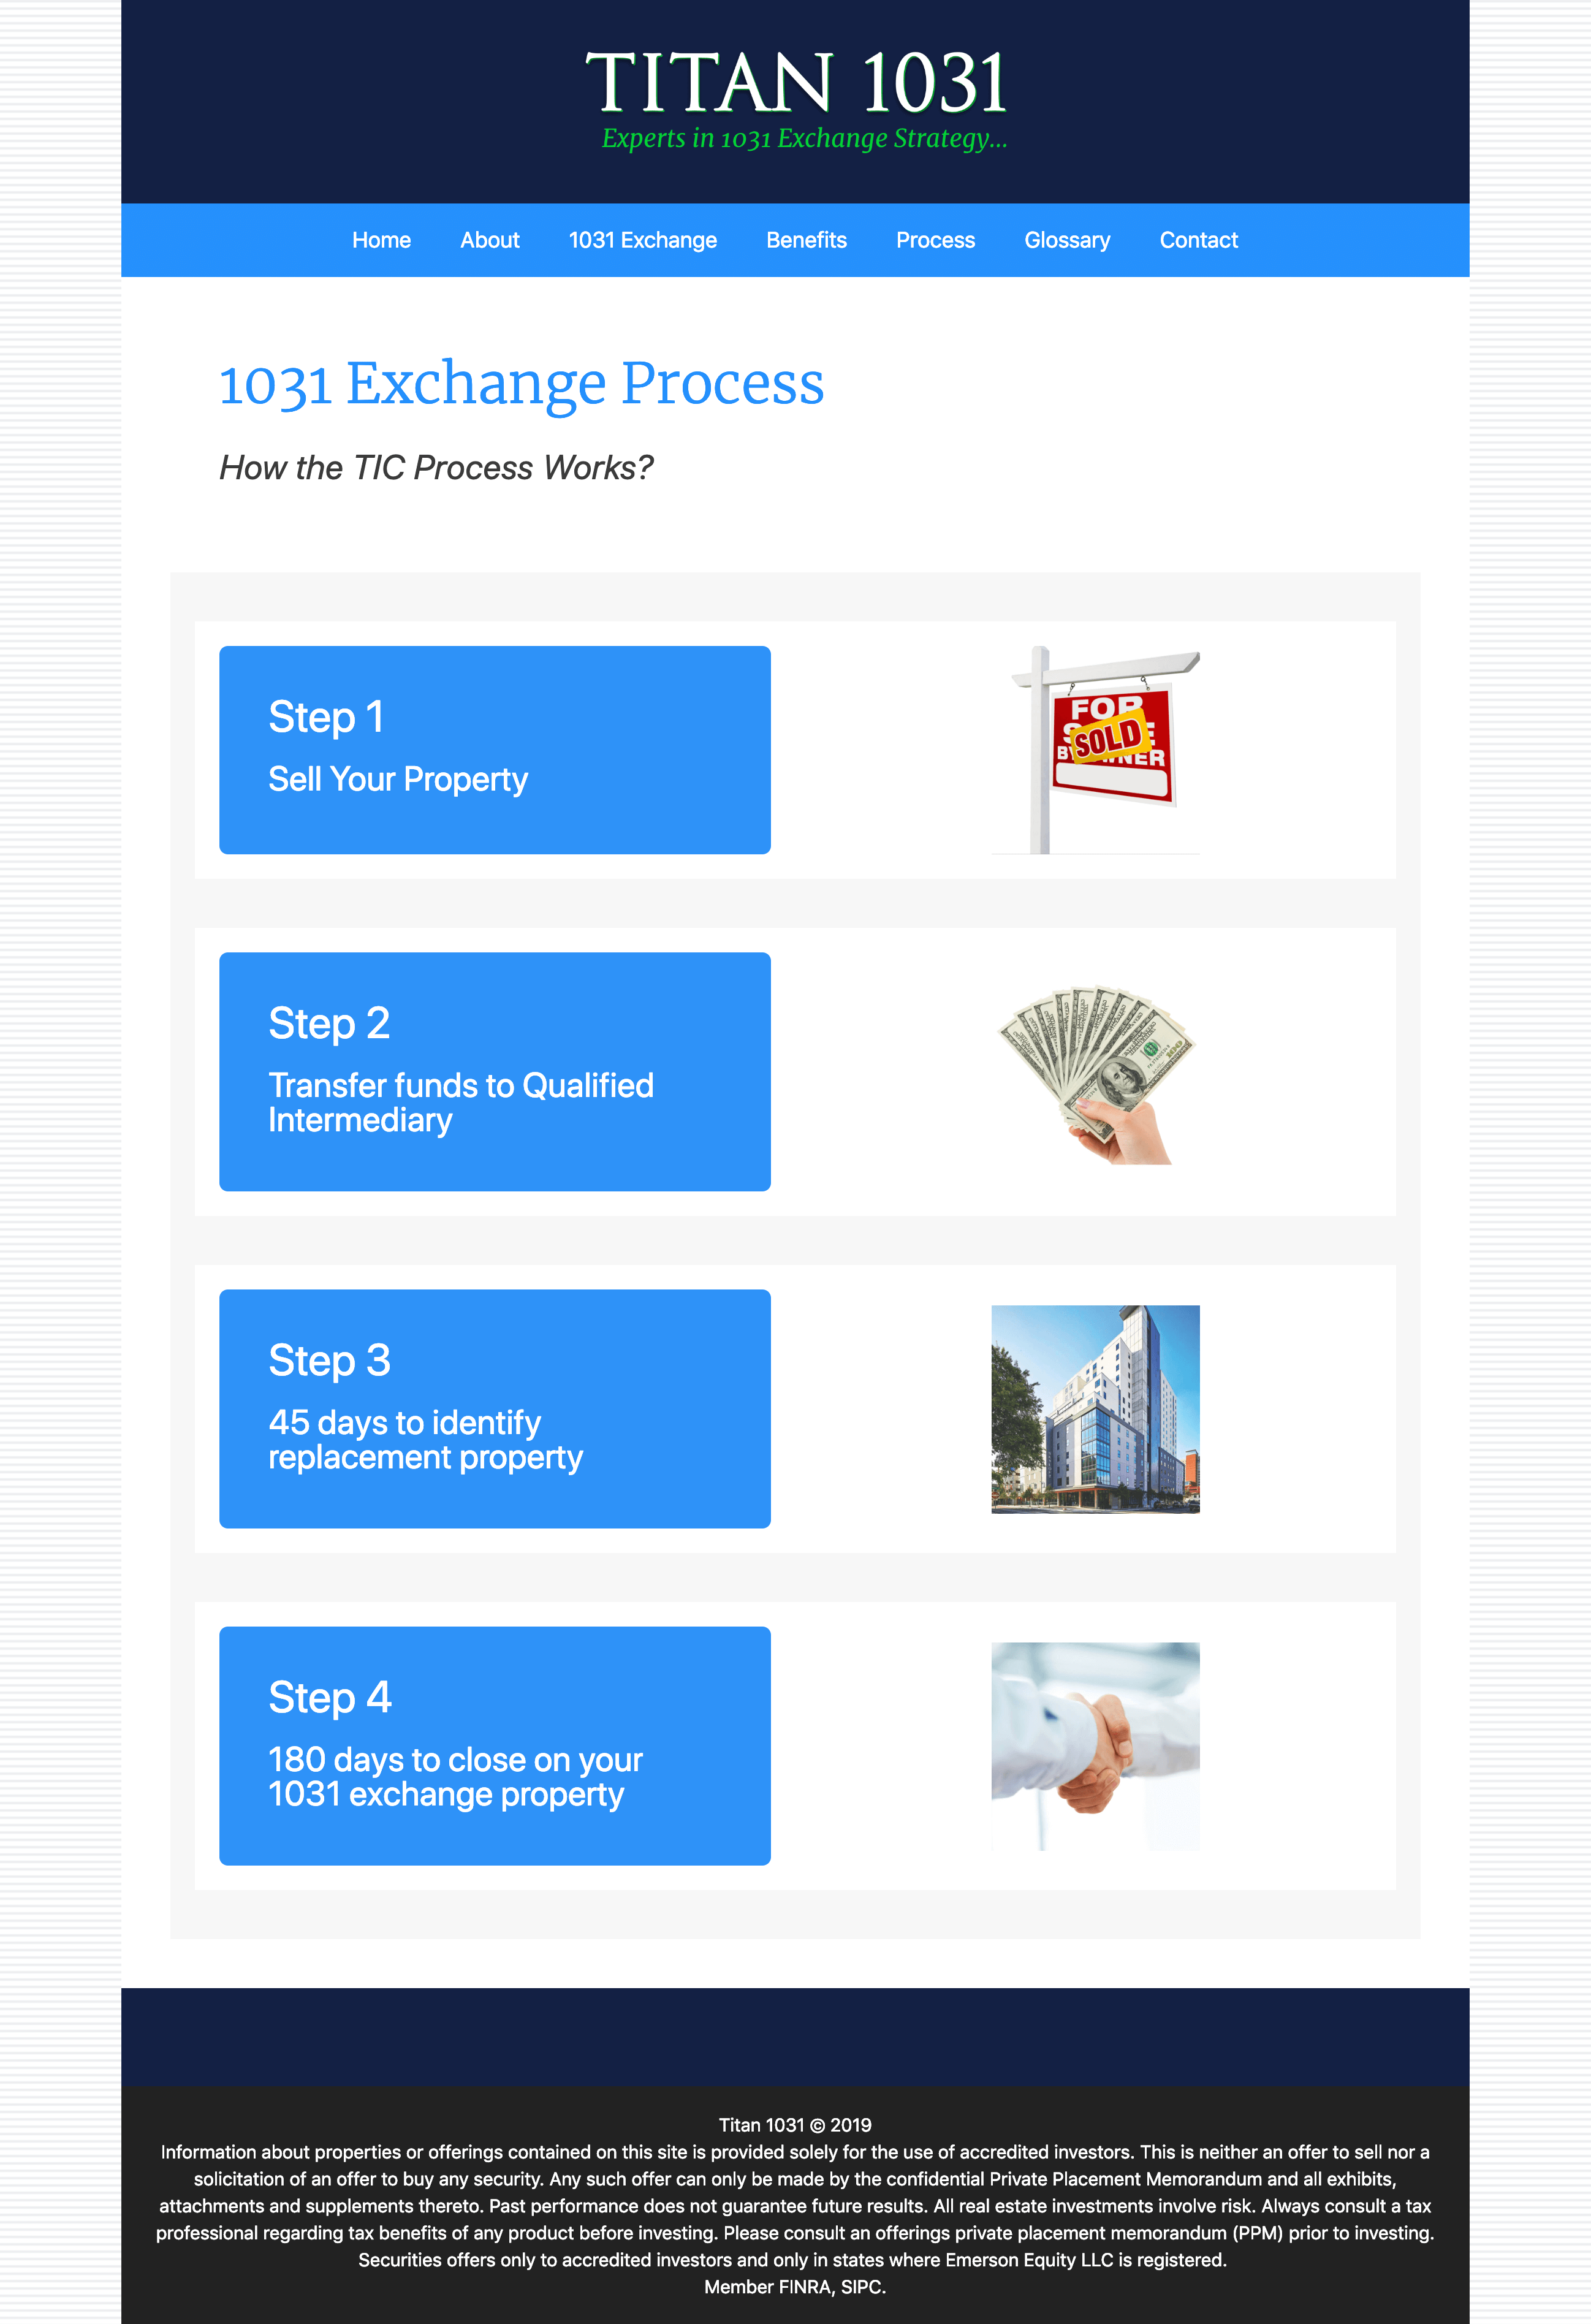 Titan-1031-Real-Estate-Exchange-Website-Design-Process-Page